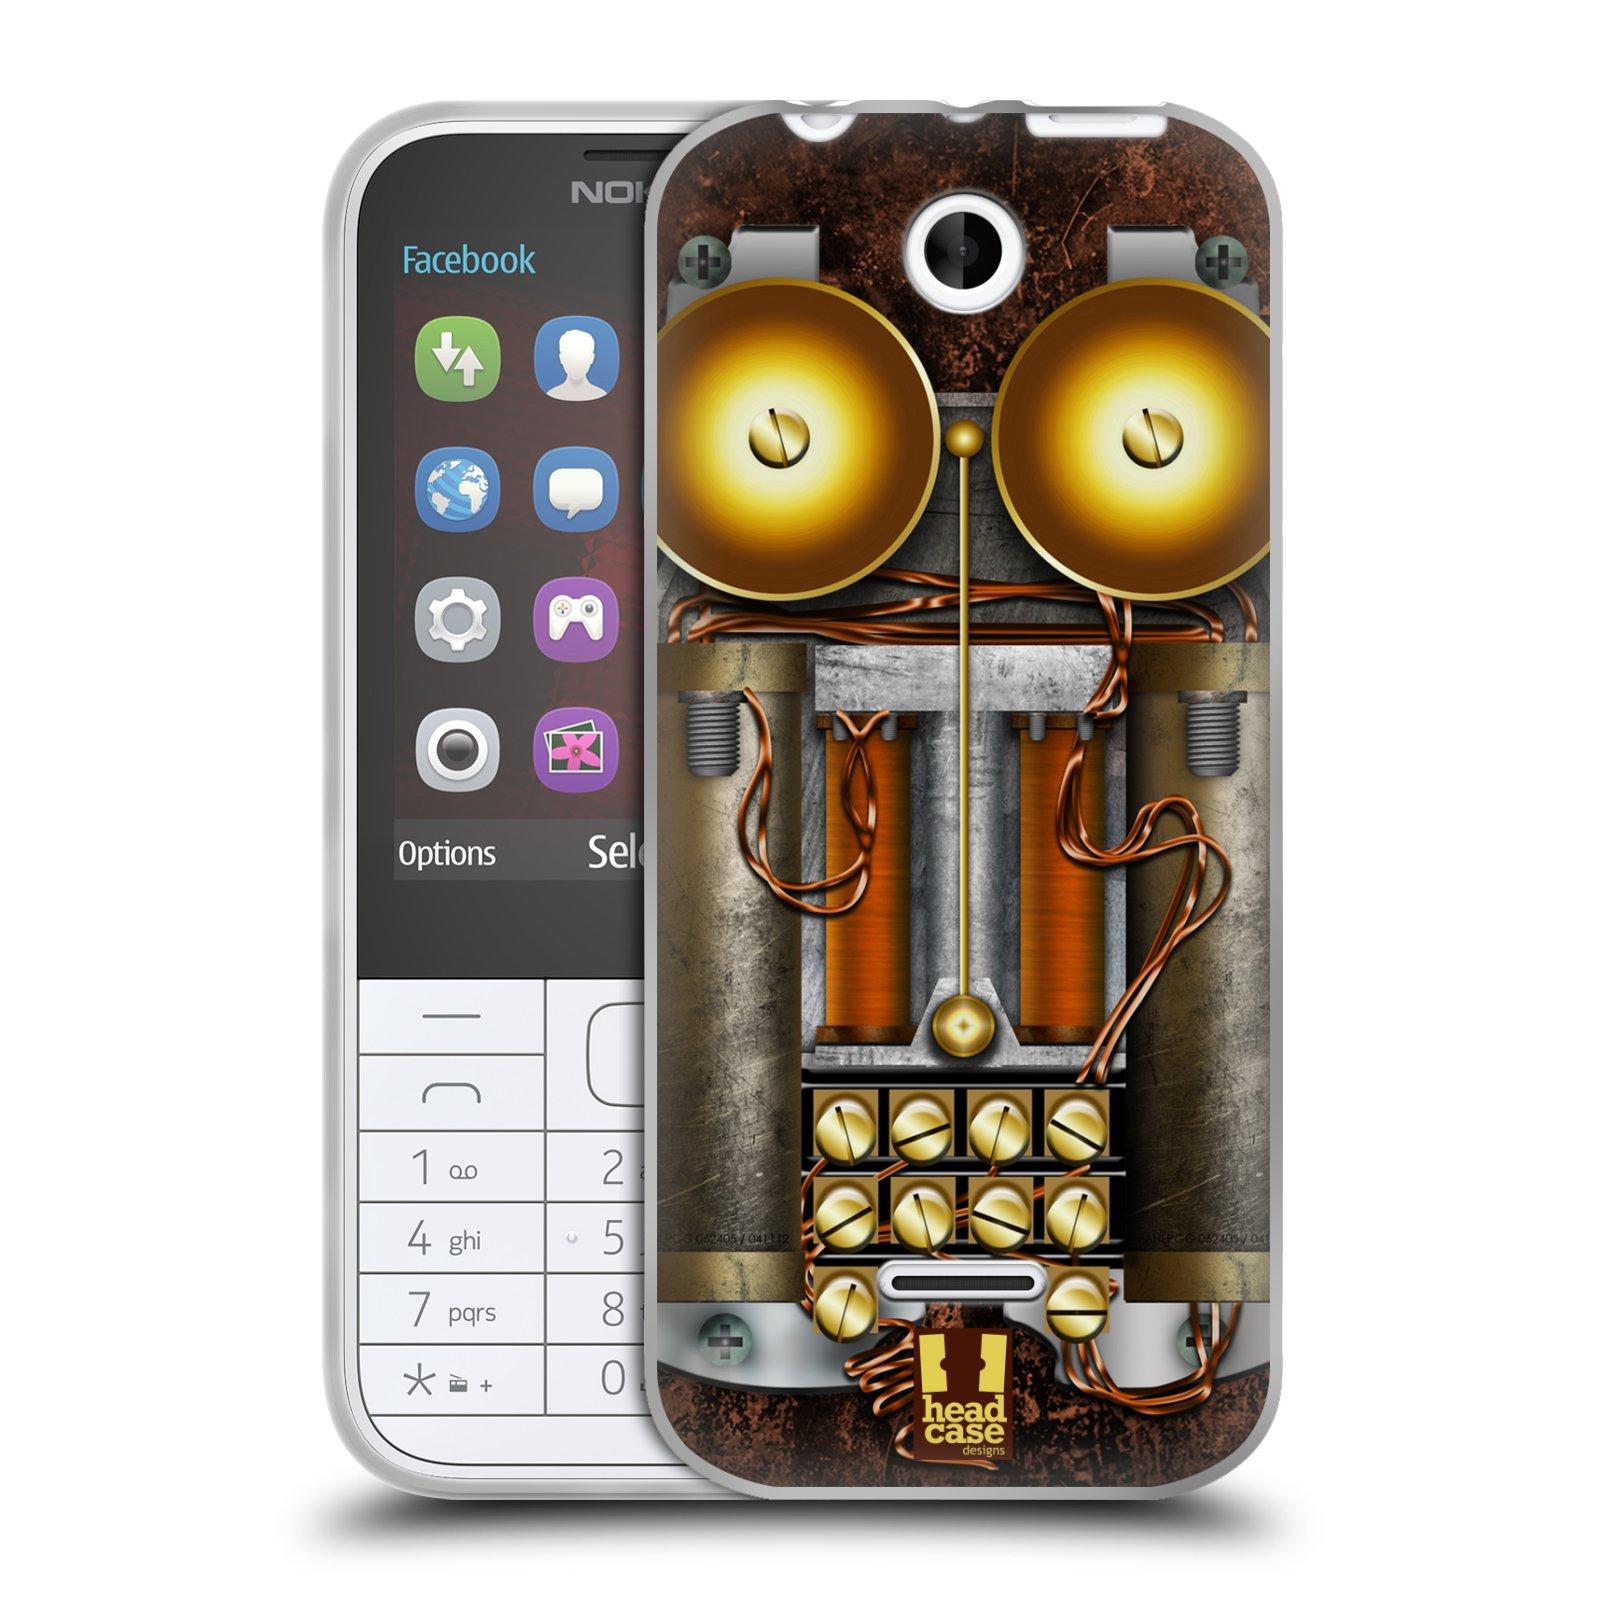 Silikonové pouzdro na mobil Nokia 225 HEAD CASE STEAMPUNK TELEFON (Silikonový kryt či obal na mobilní telefon Nokia 225)